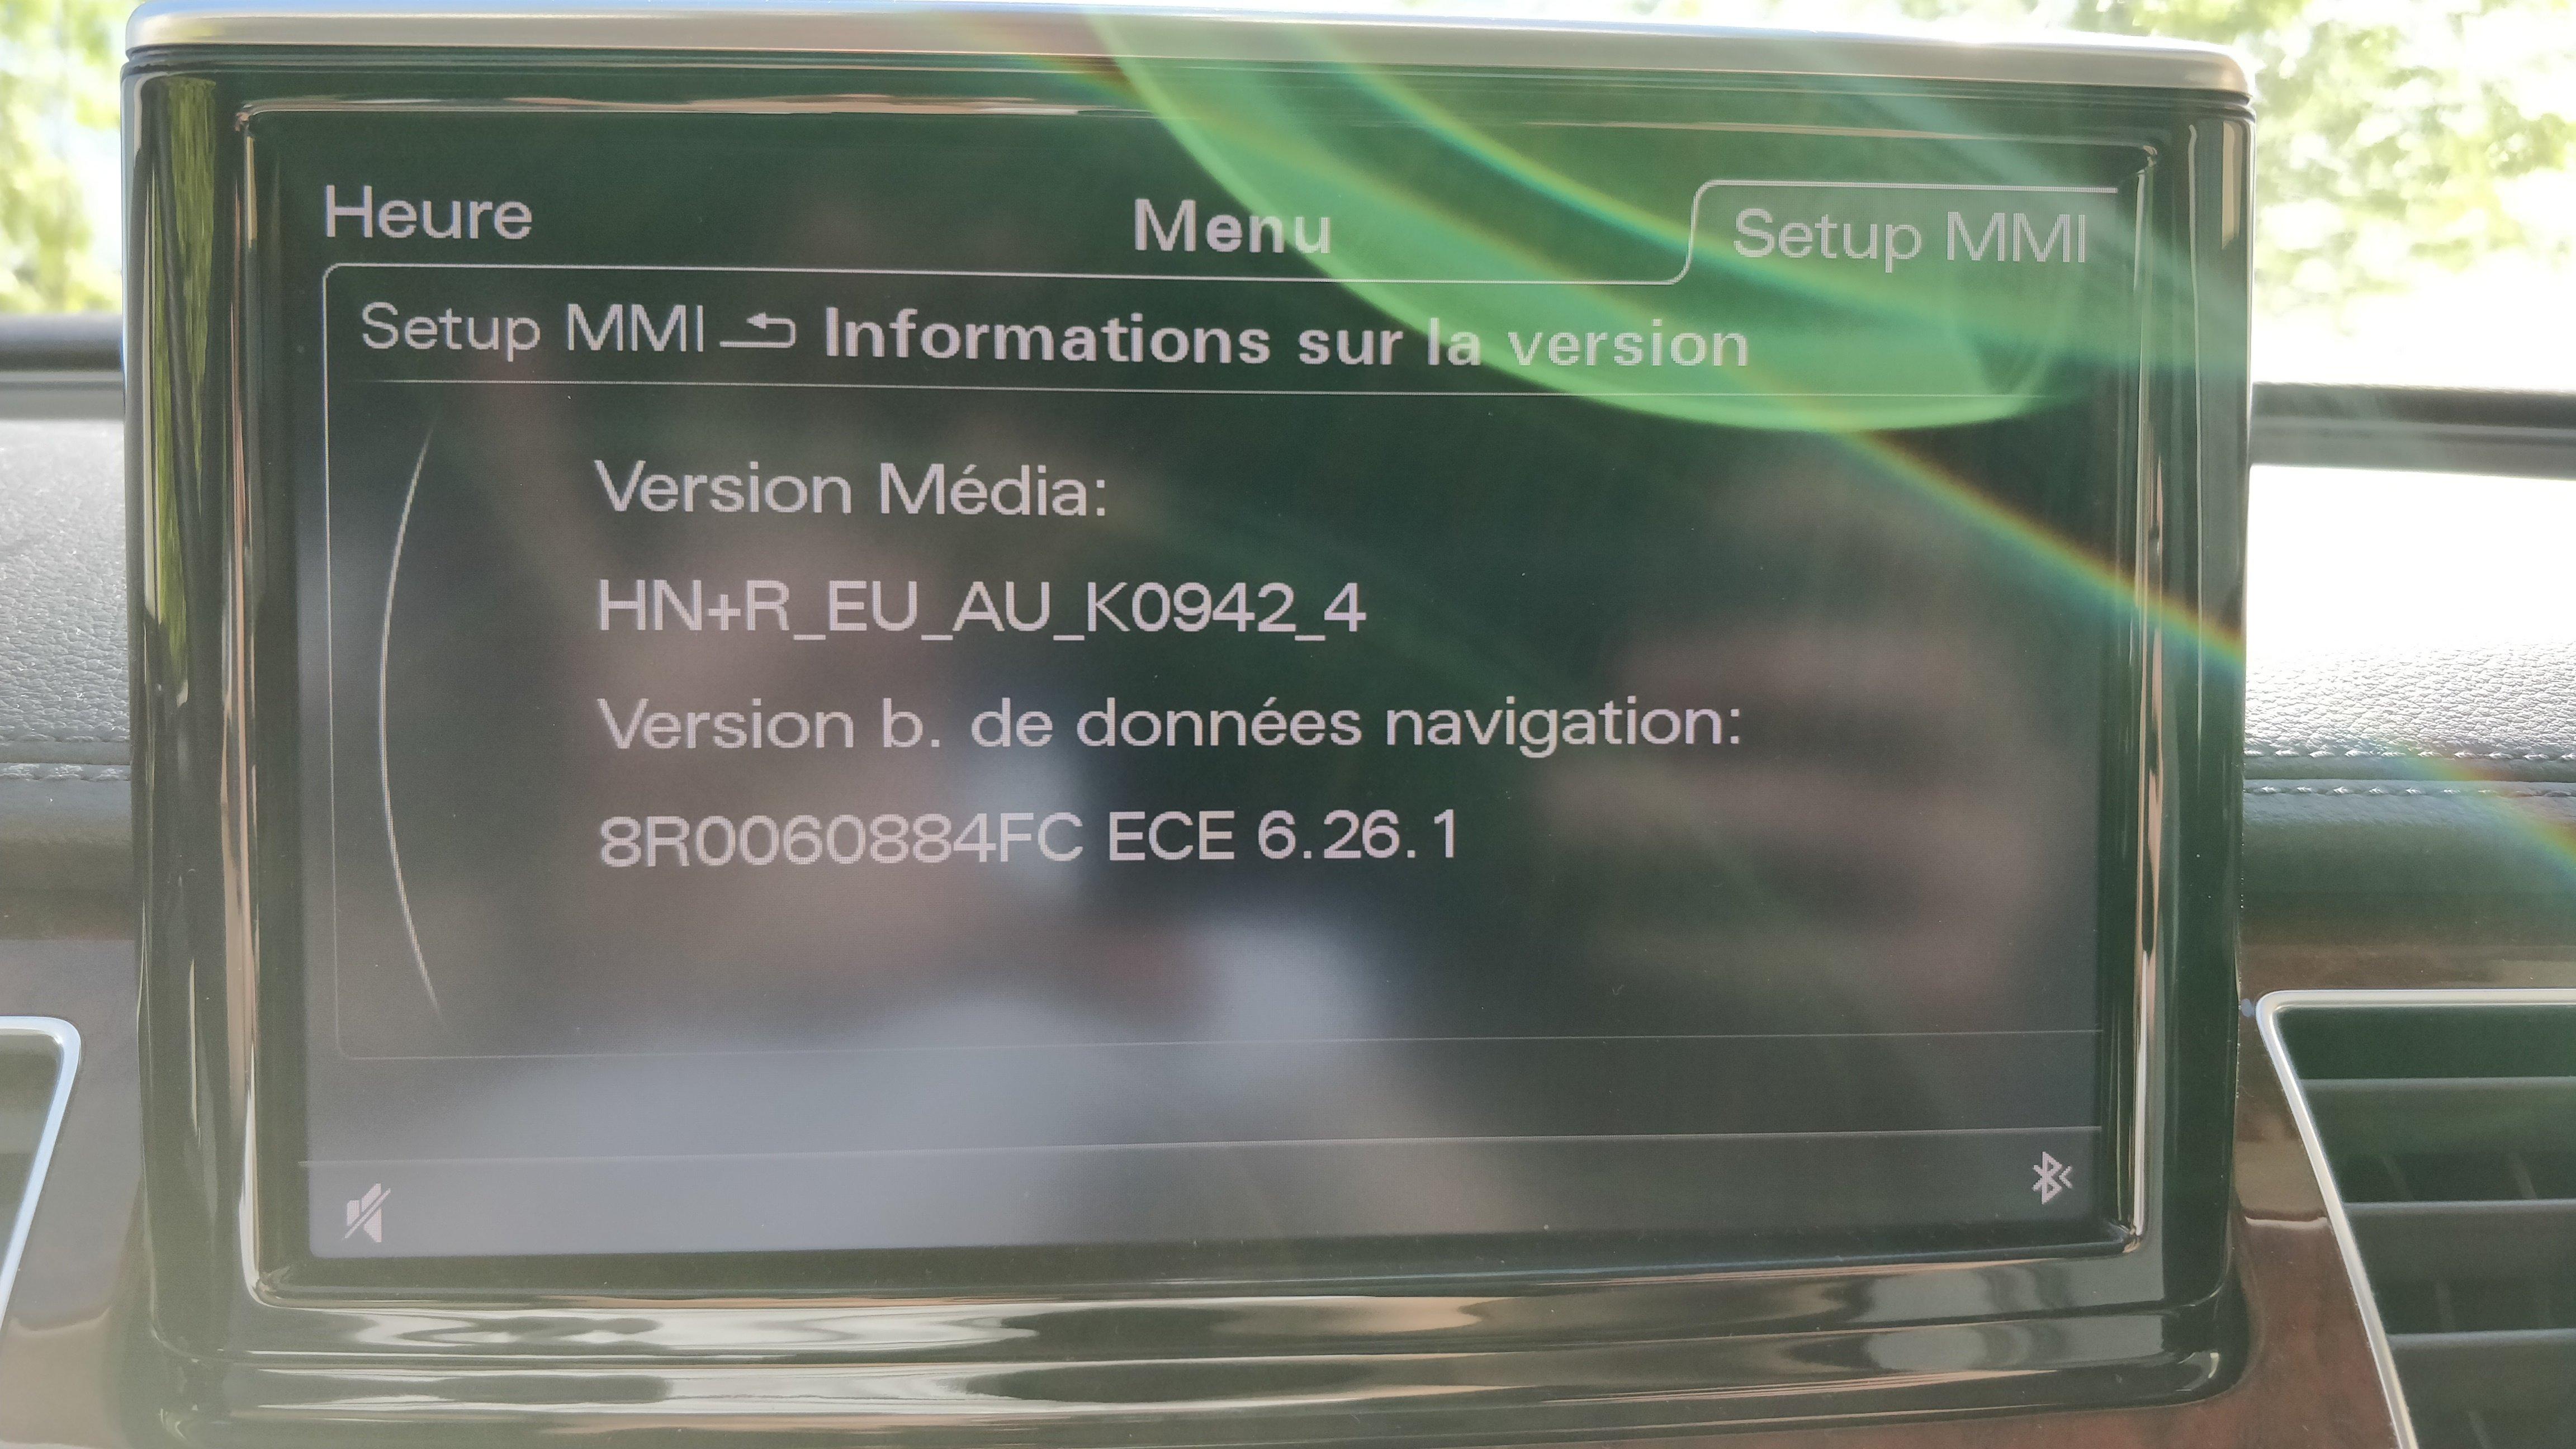 Mise à jour MMI sw : hn+_eu_au_p0065 - MMI 2G - 3G - 3G Plus